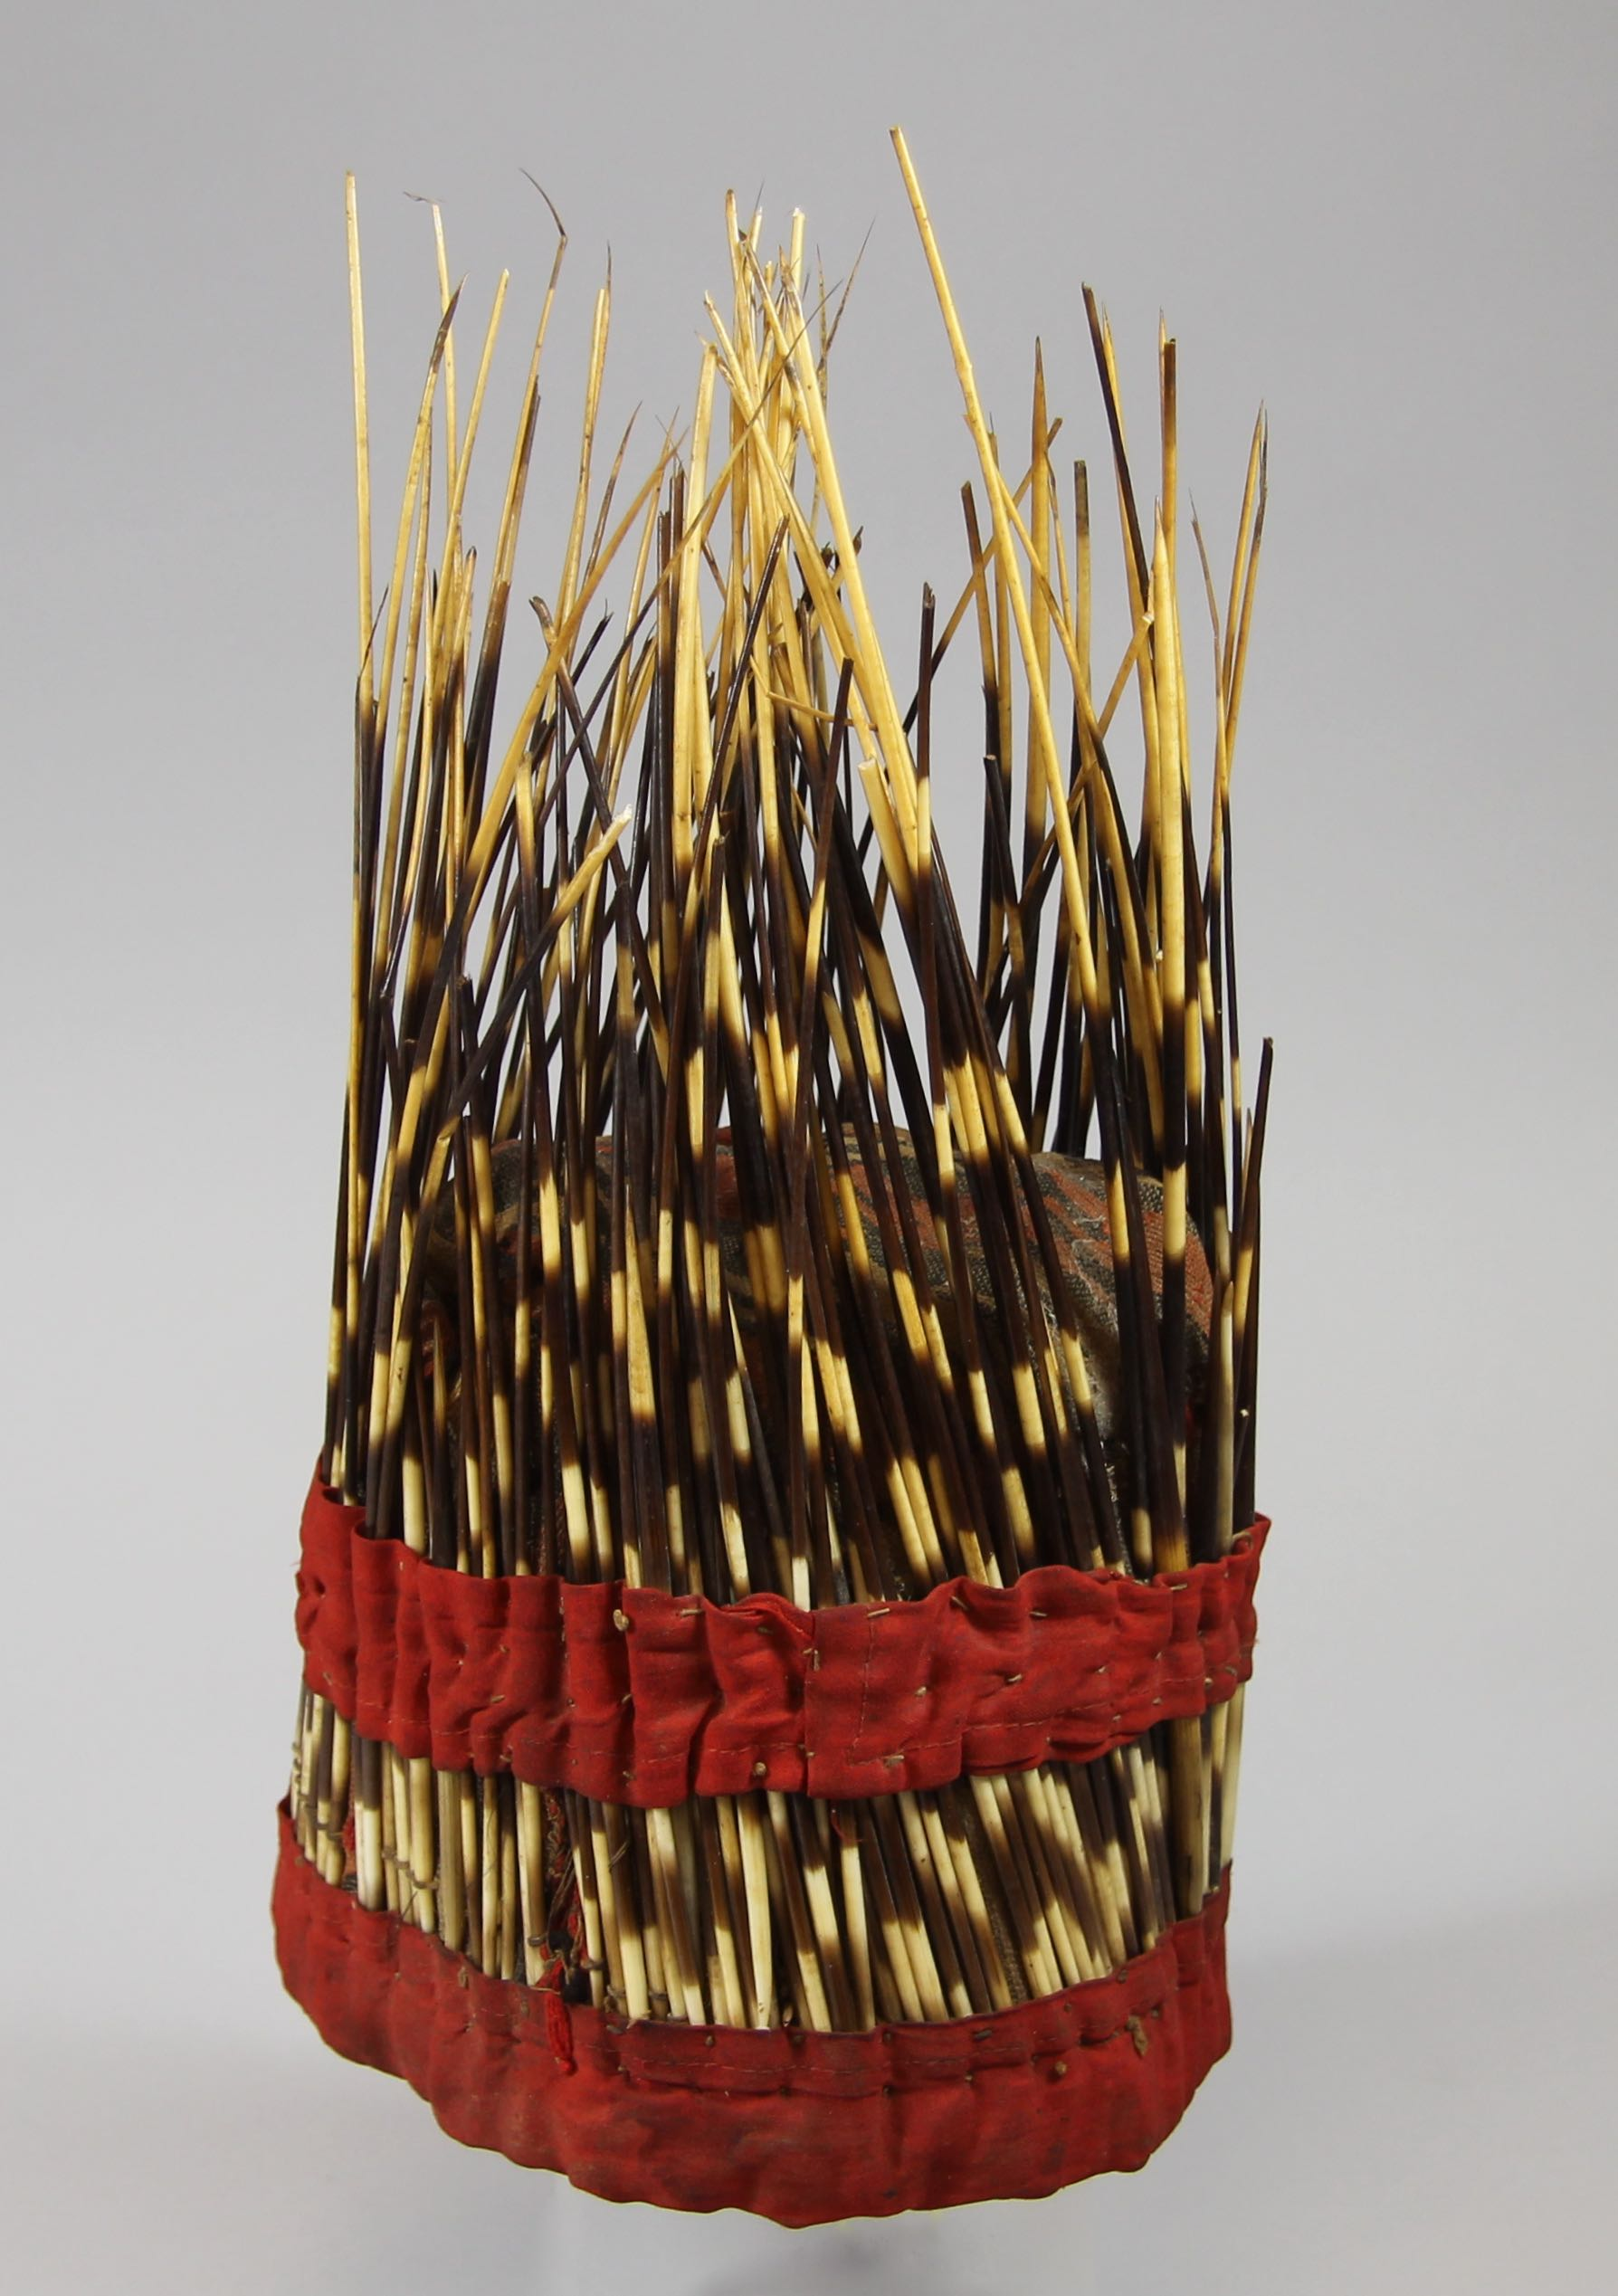 Shaman's headdress